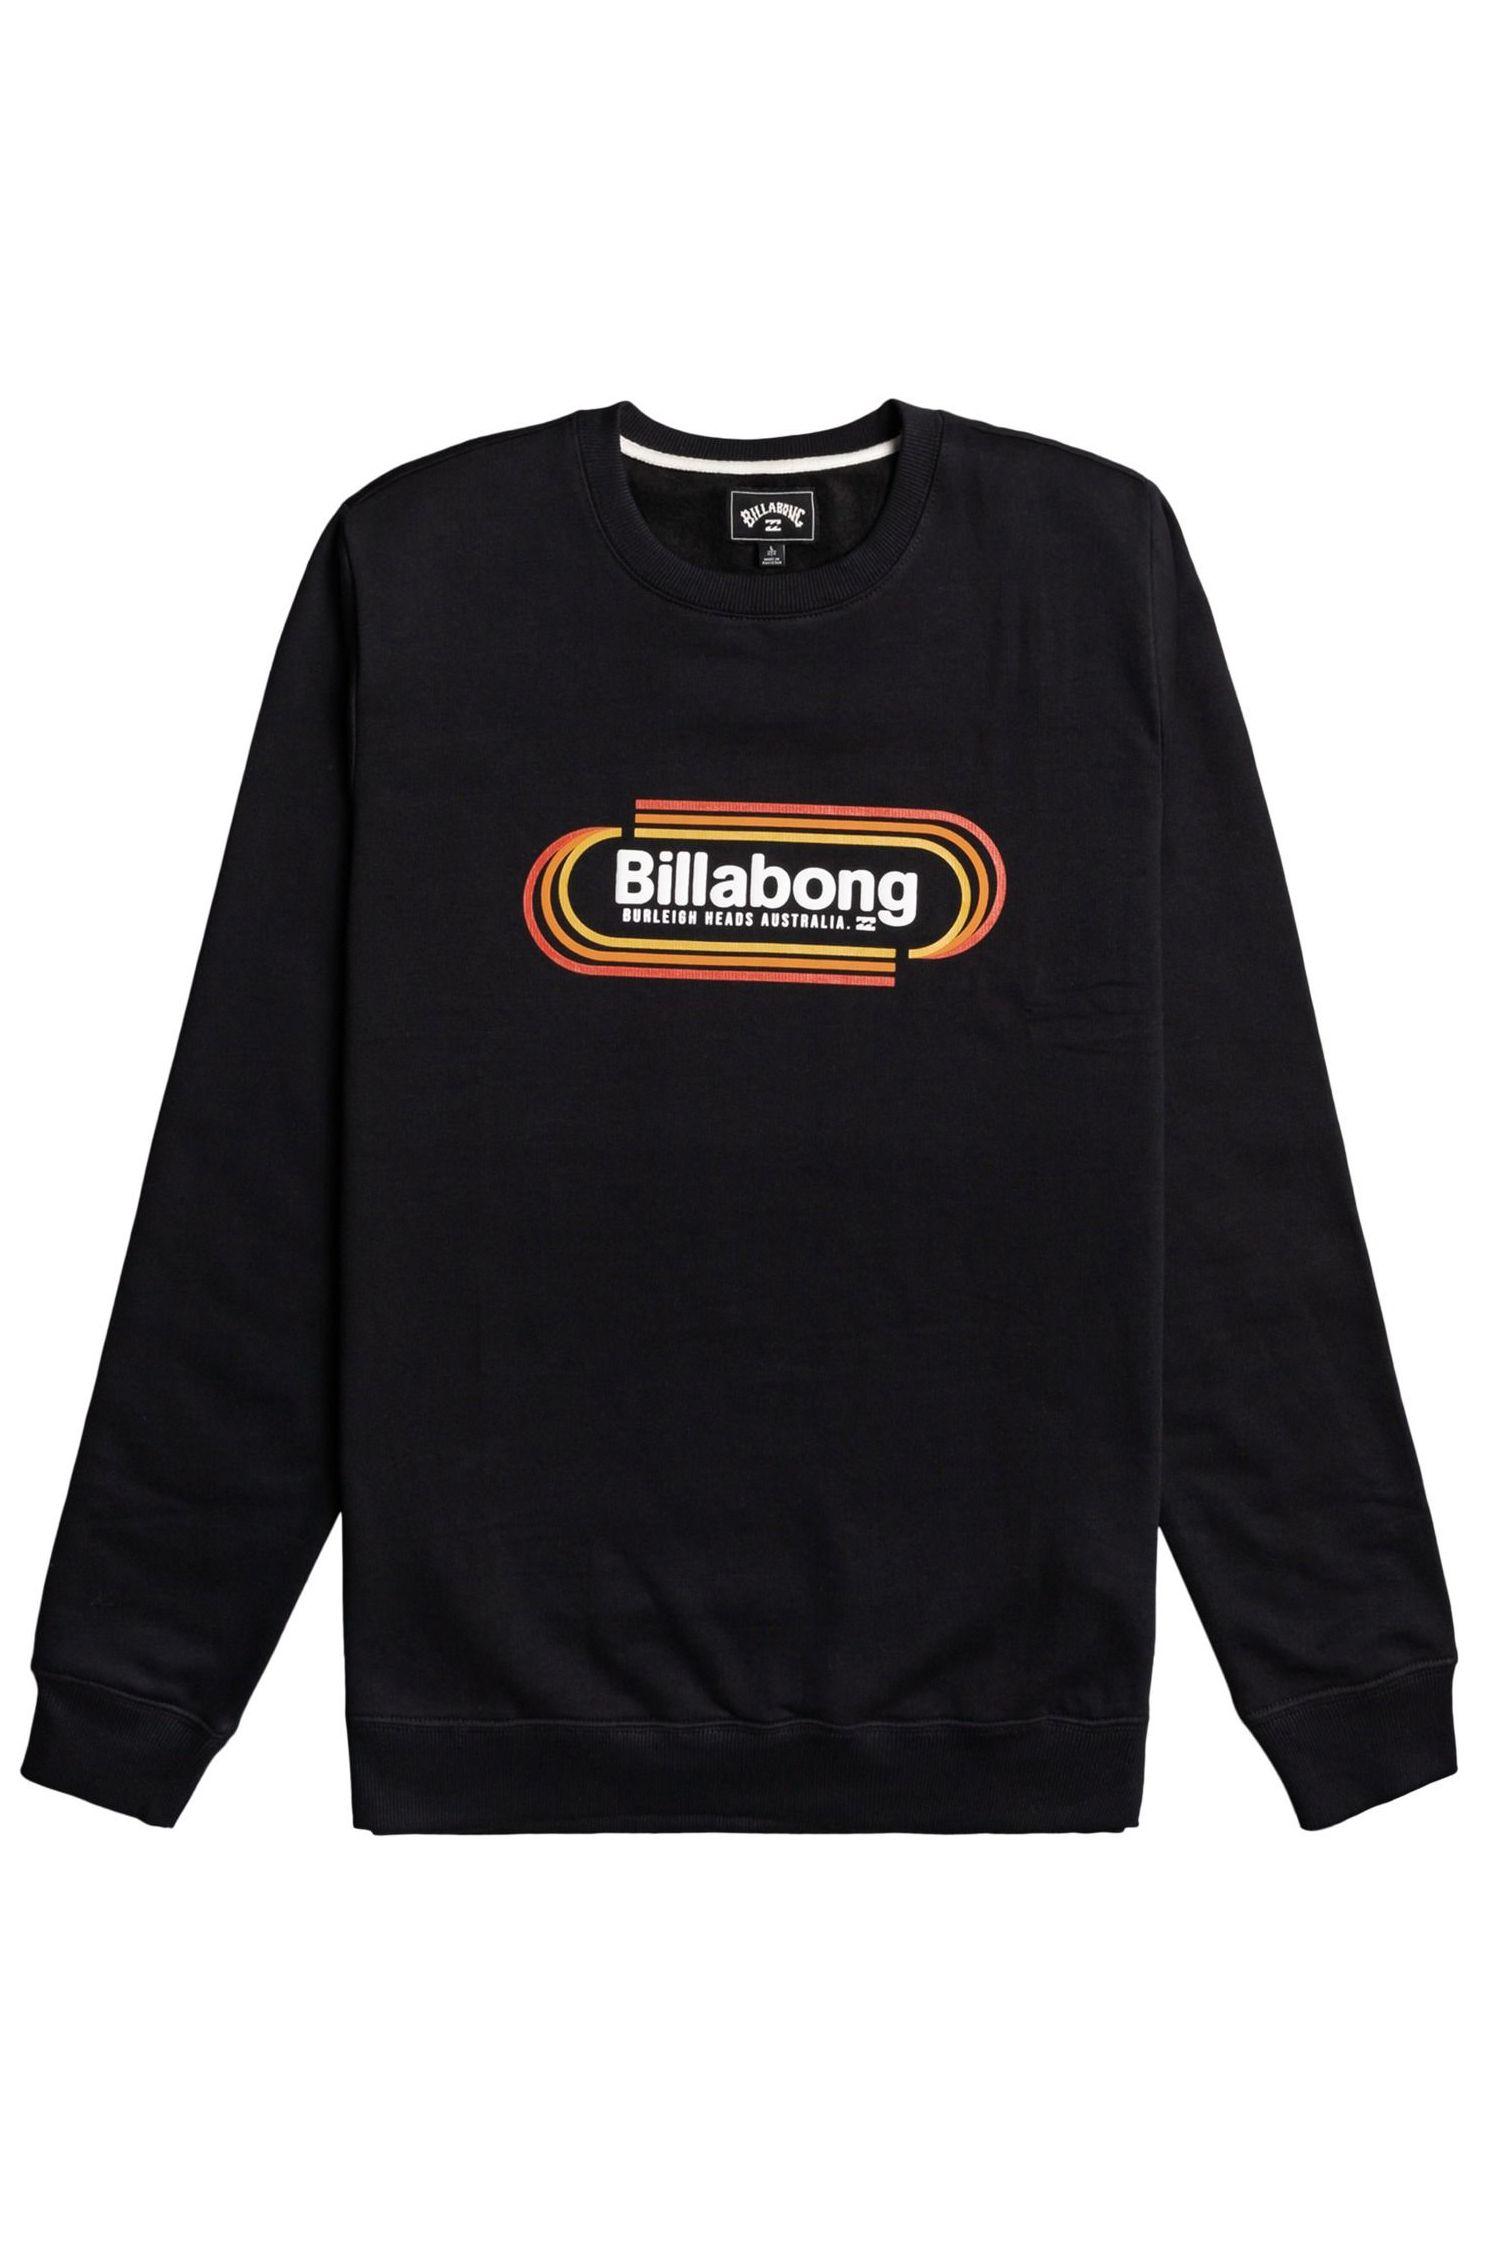 Billabong Crew Sweat ROAD STOP CR SPORTING GOOD PROGR. Black